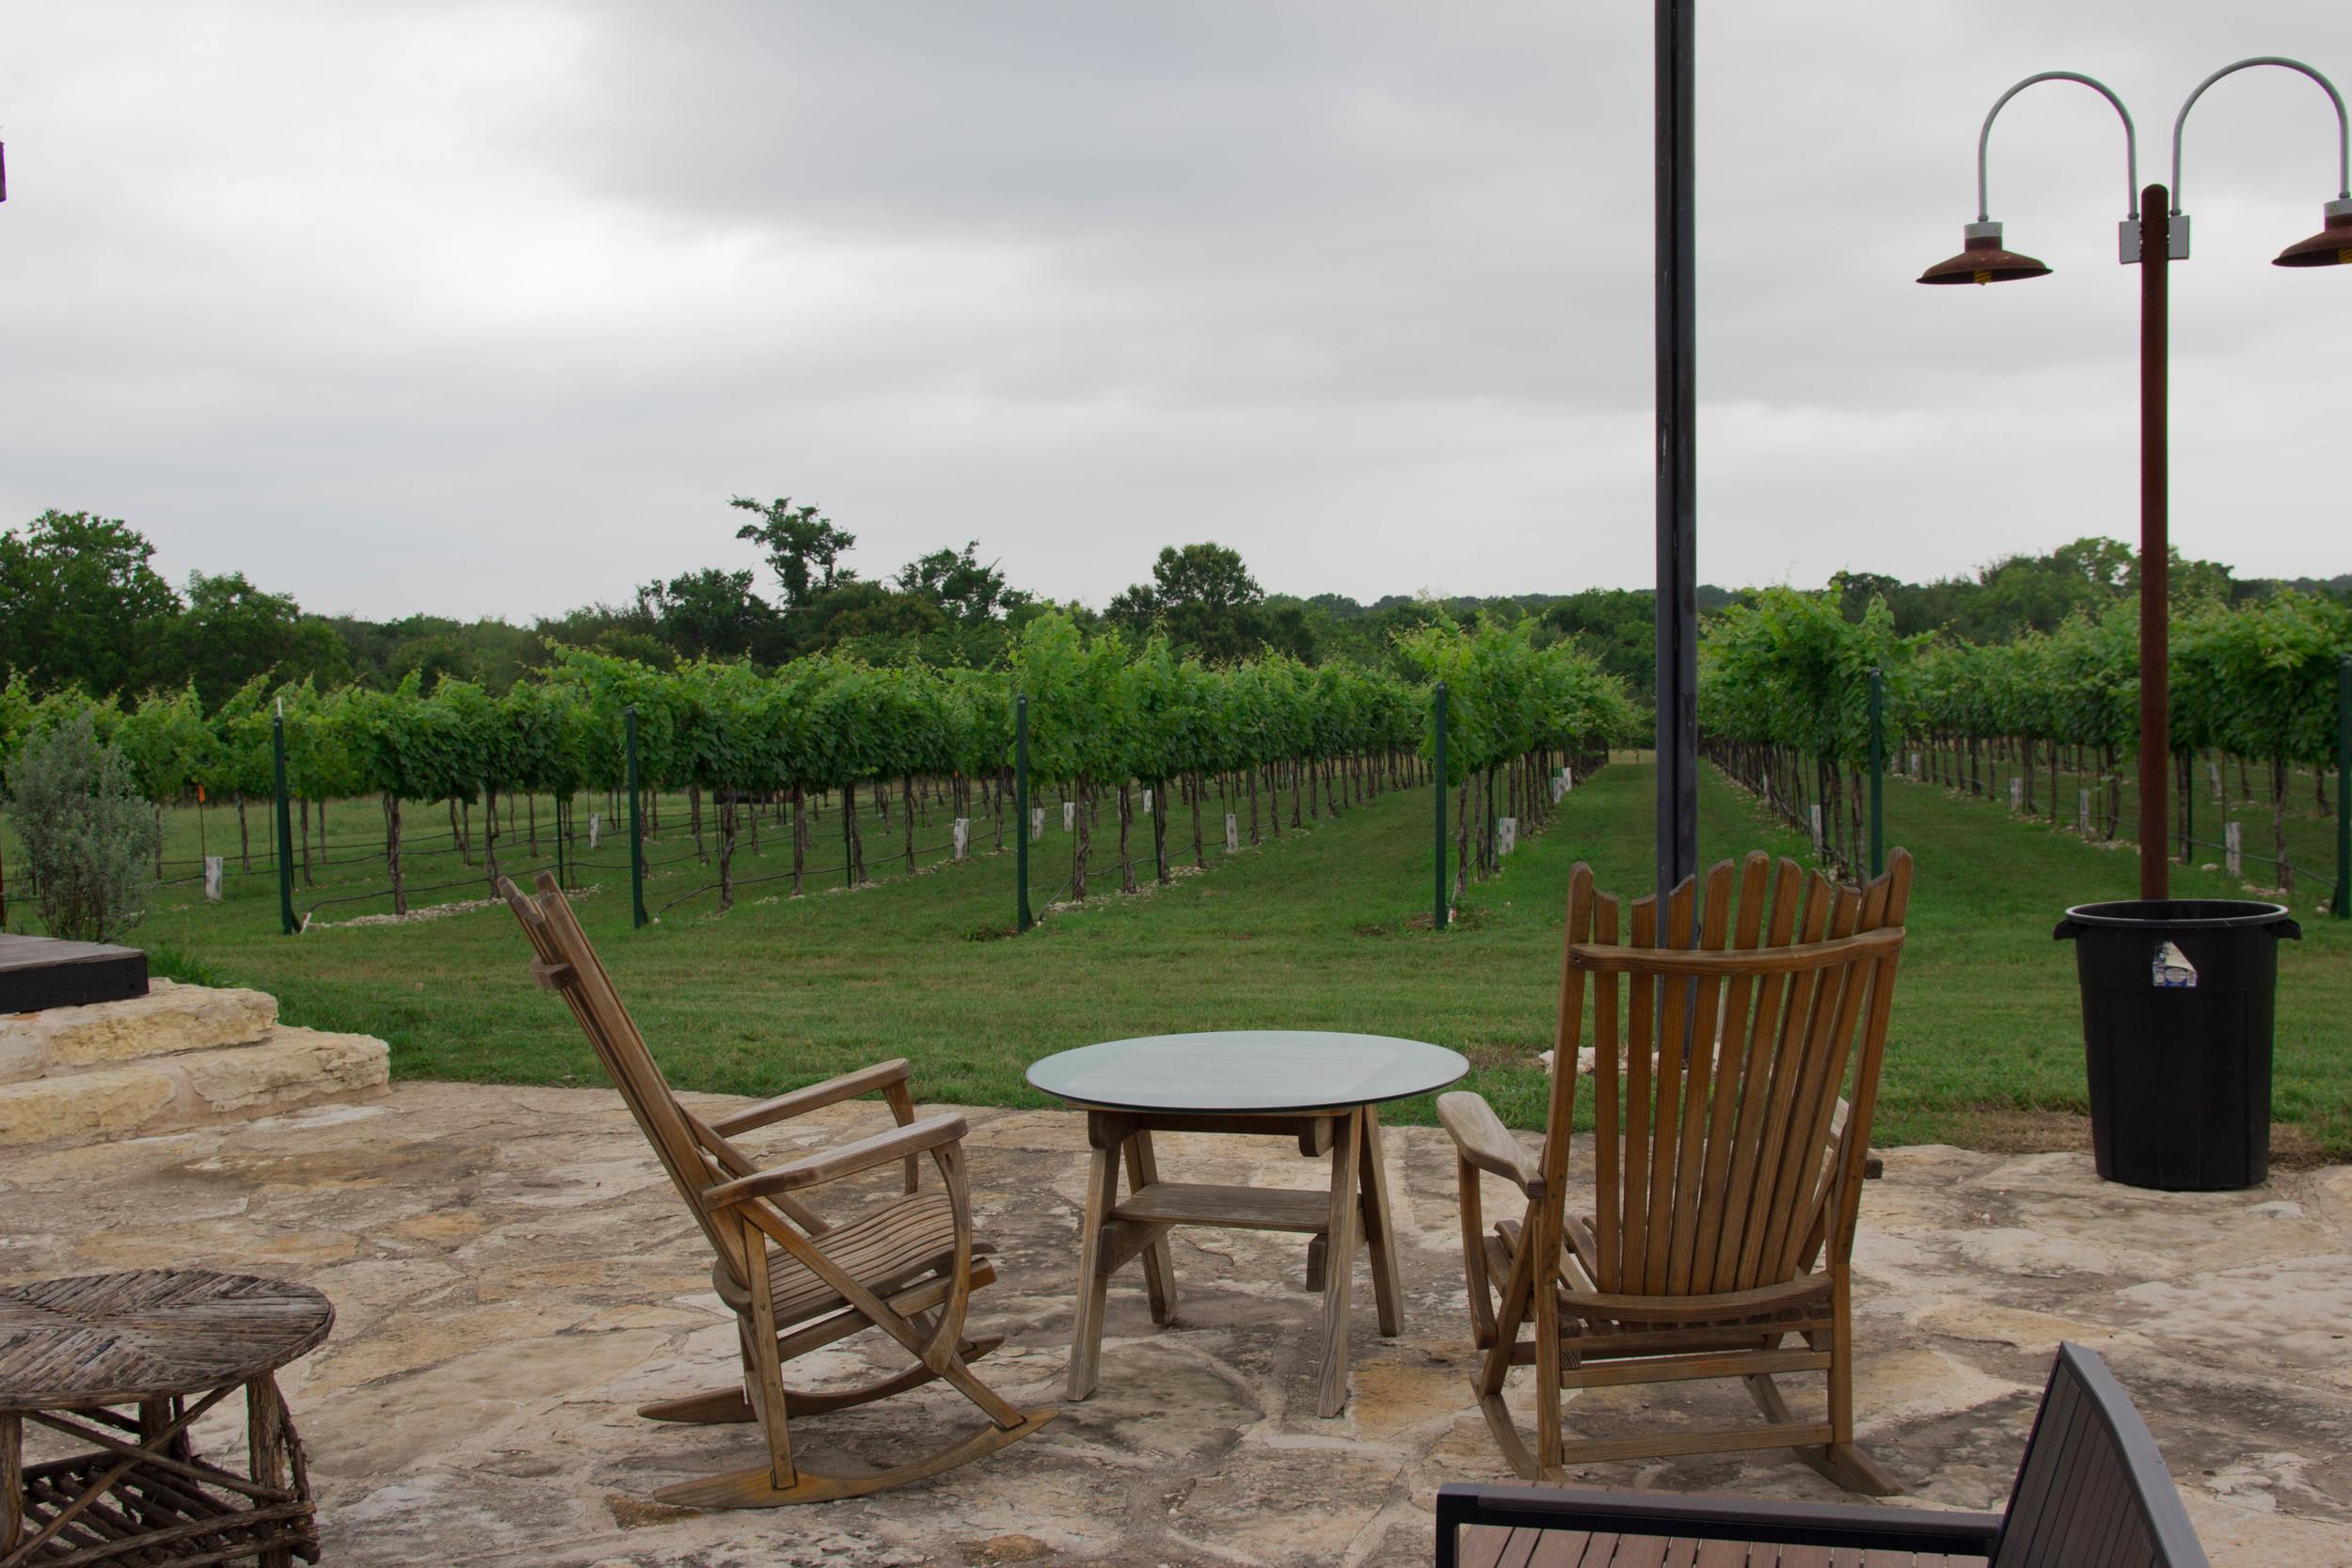 ark and co white mesh striped dress, waco, meridian, texas winery, vineyards, wine, karen walker super sunglasses, halogen valentino rockstud flats, kendra scott lauren flats